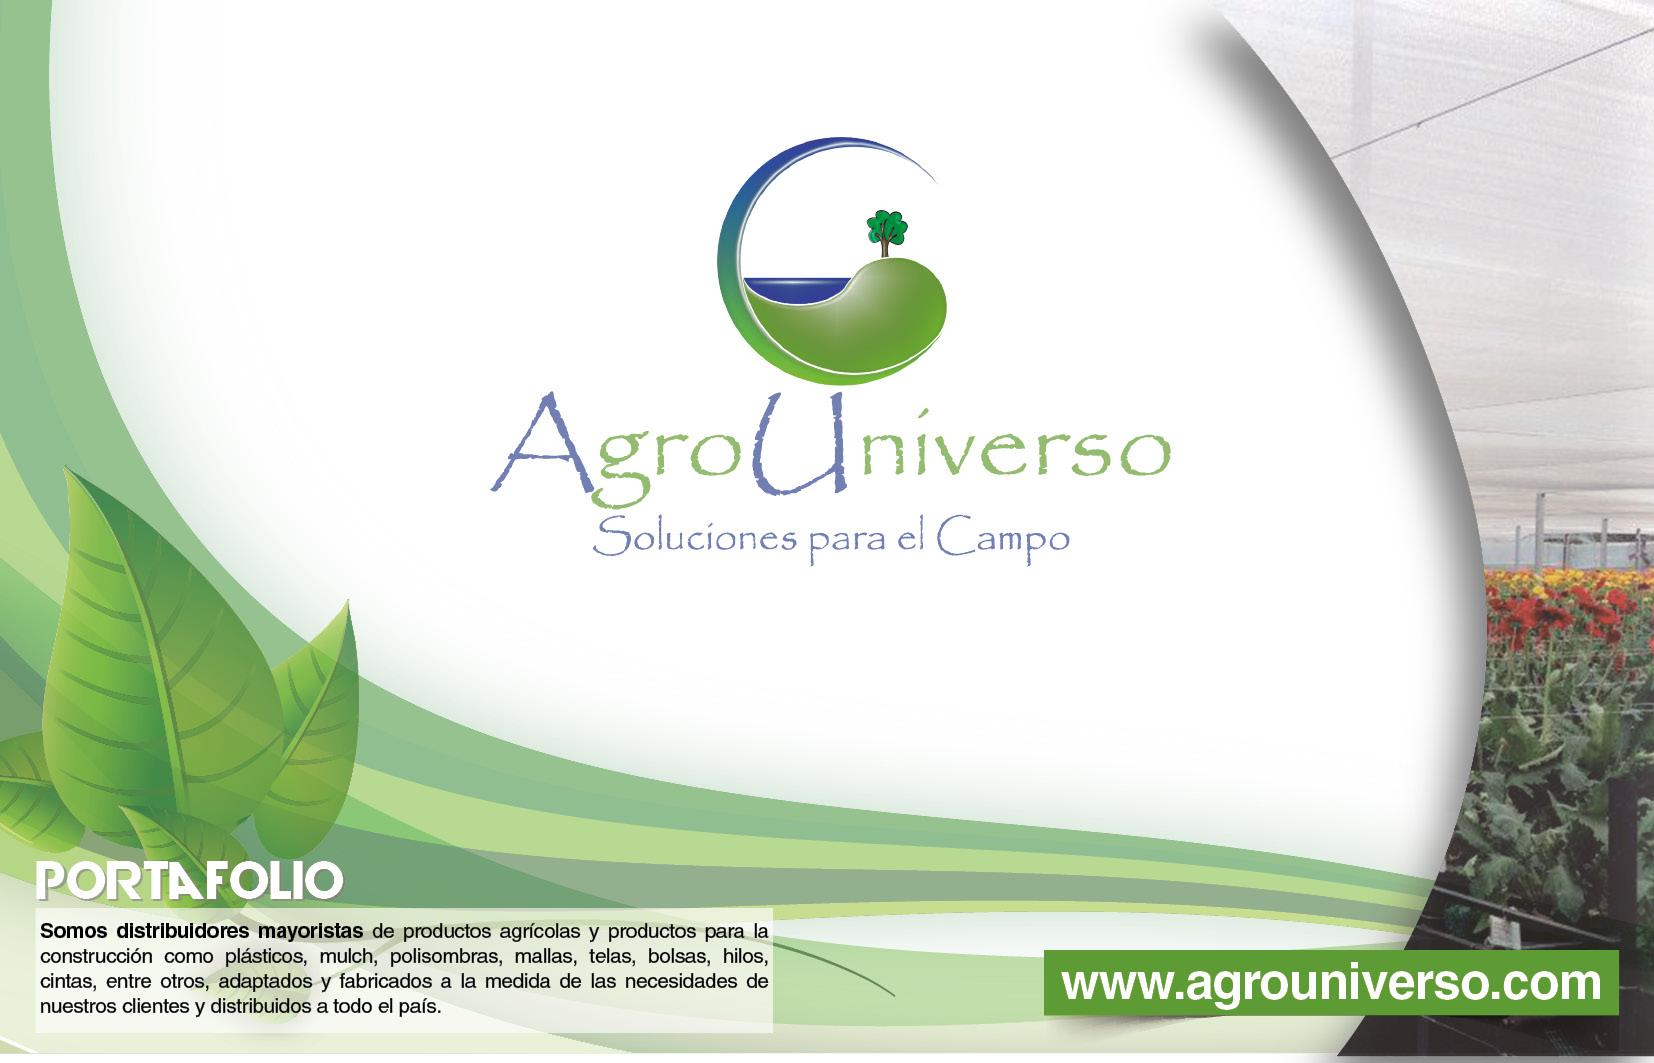 Catlogo-de-productos-Agrouniverso-